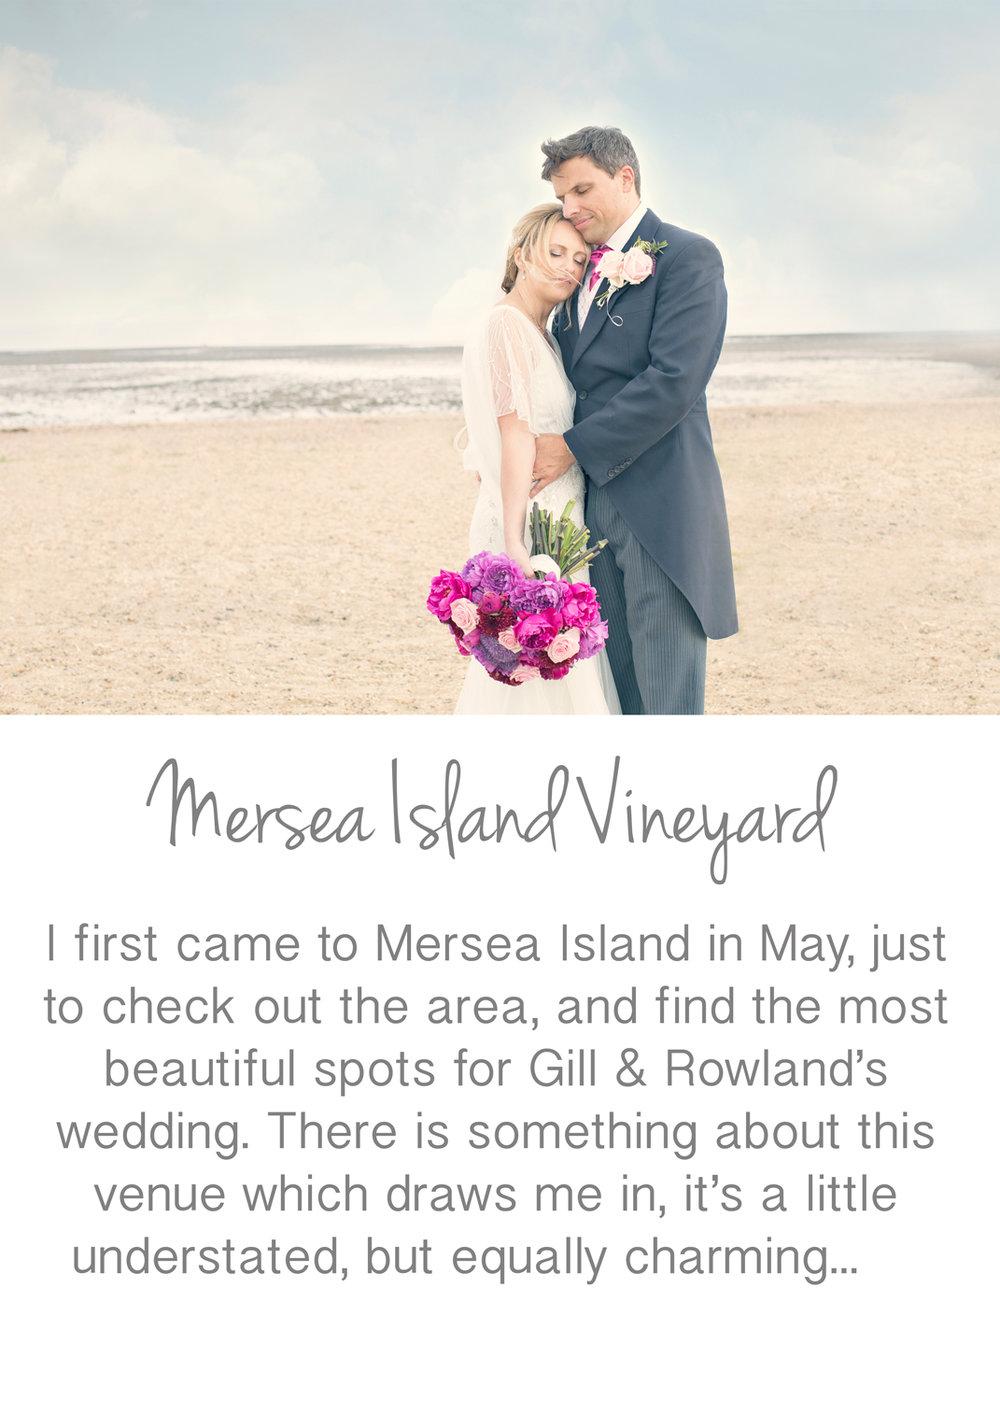 mersea-island-vineyard-sw.jpg